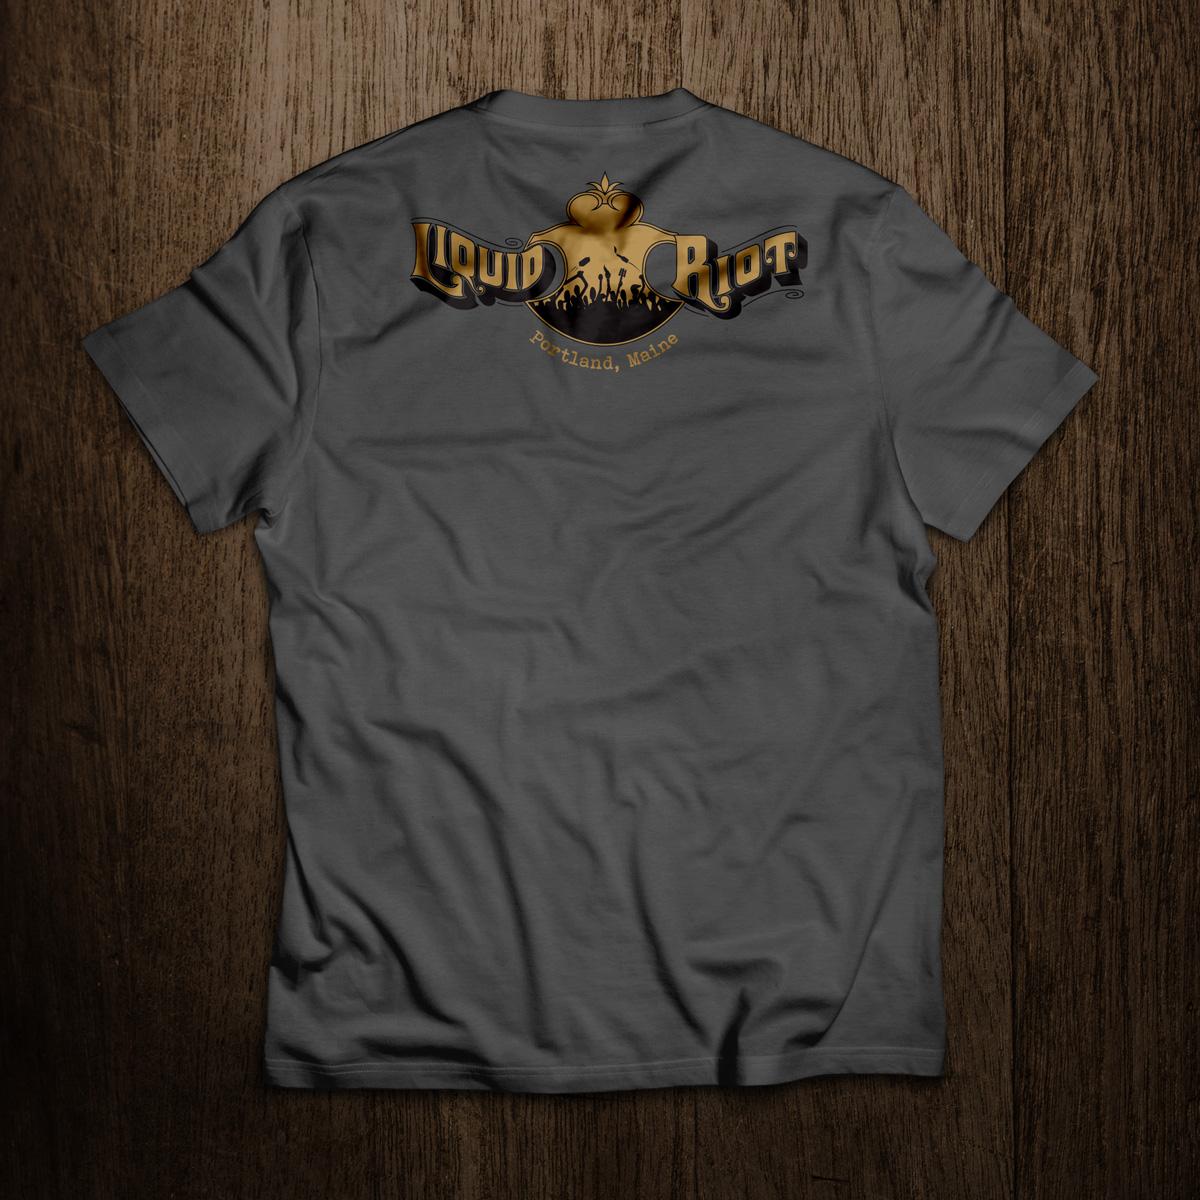 Liquid Riot Old Port Straight Bourbon Whiskey T-shirt (Back)